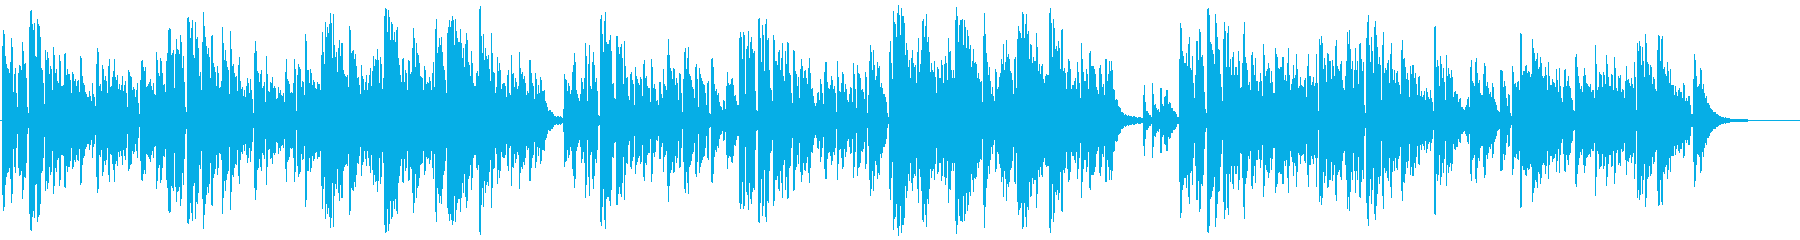 Meltingの再生済みの波形